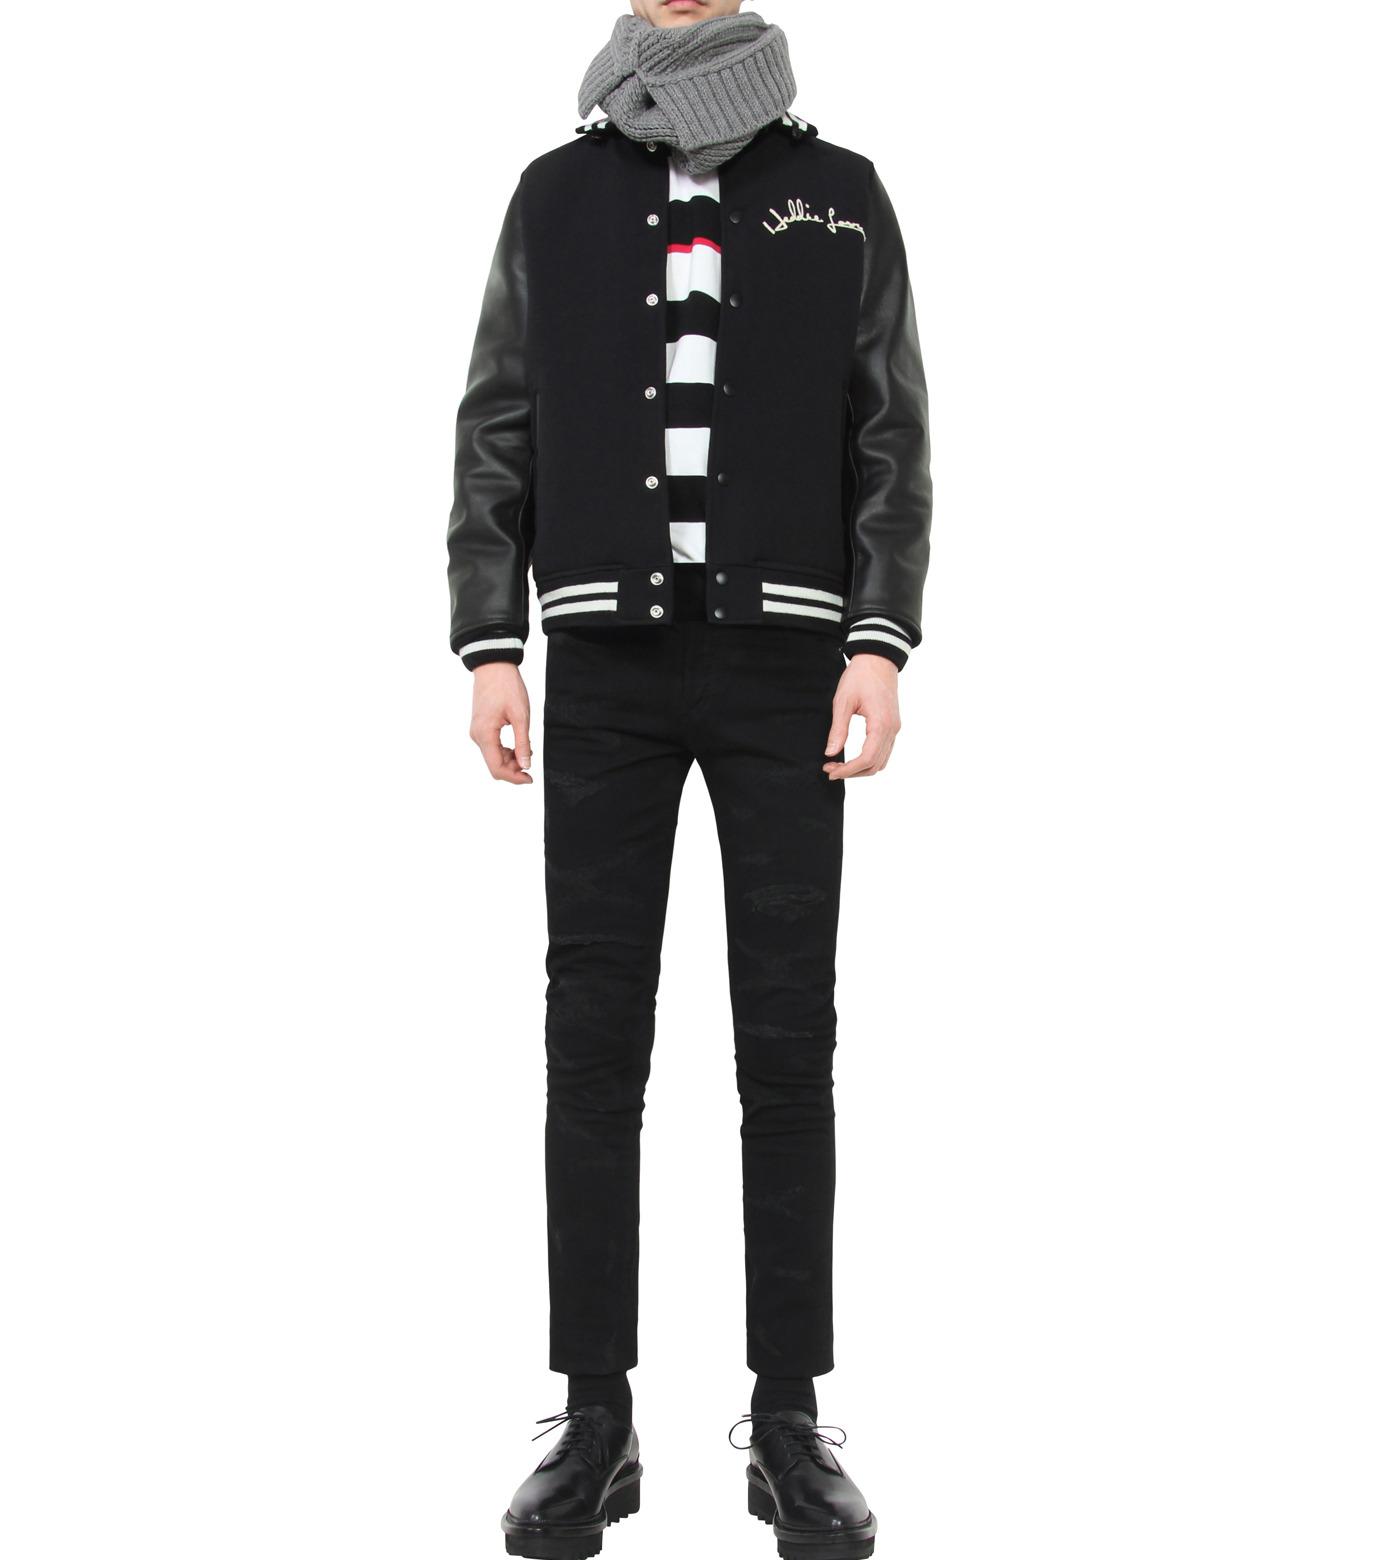 HL HEDDIE LOVU(エイチエル・エディールーヴ)のSTADIUM JACKET-BLACK(ジャケット/jacket)-18S94002-13 拡大詳細画像3